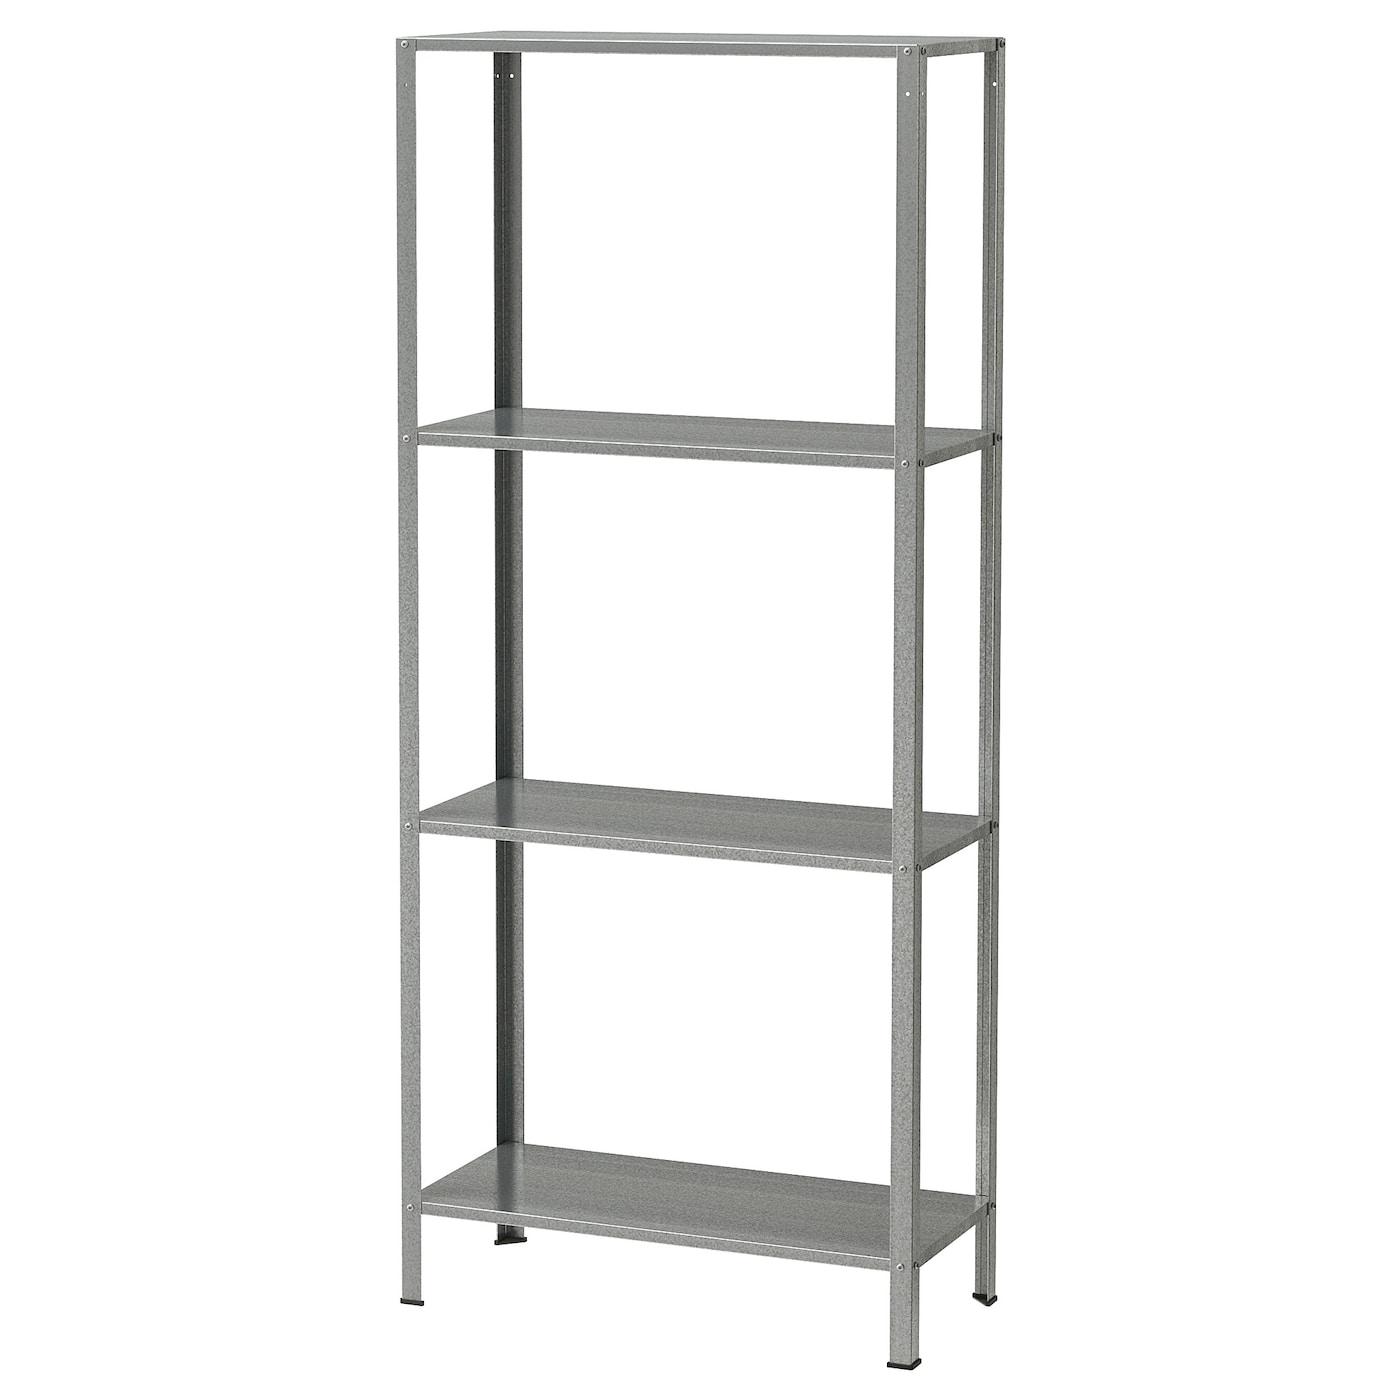 Shelf Unit Hyllis Indoor Outdoor Galvanized